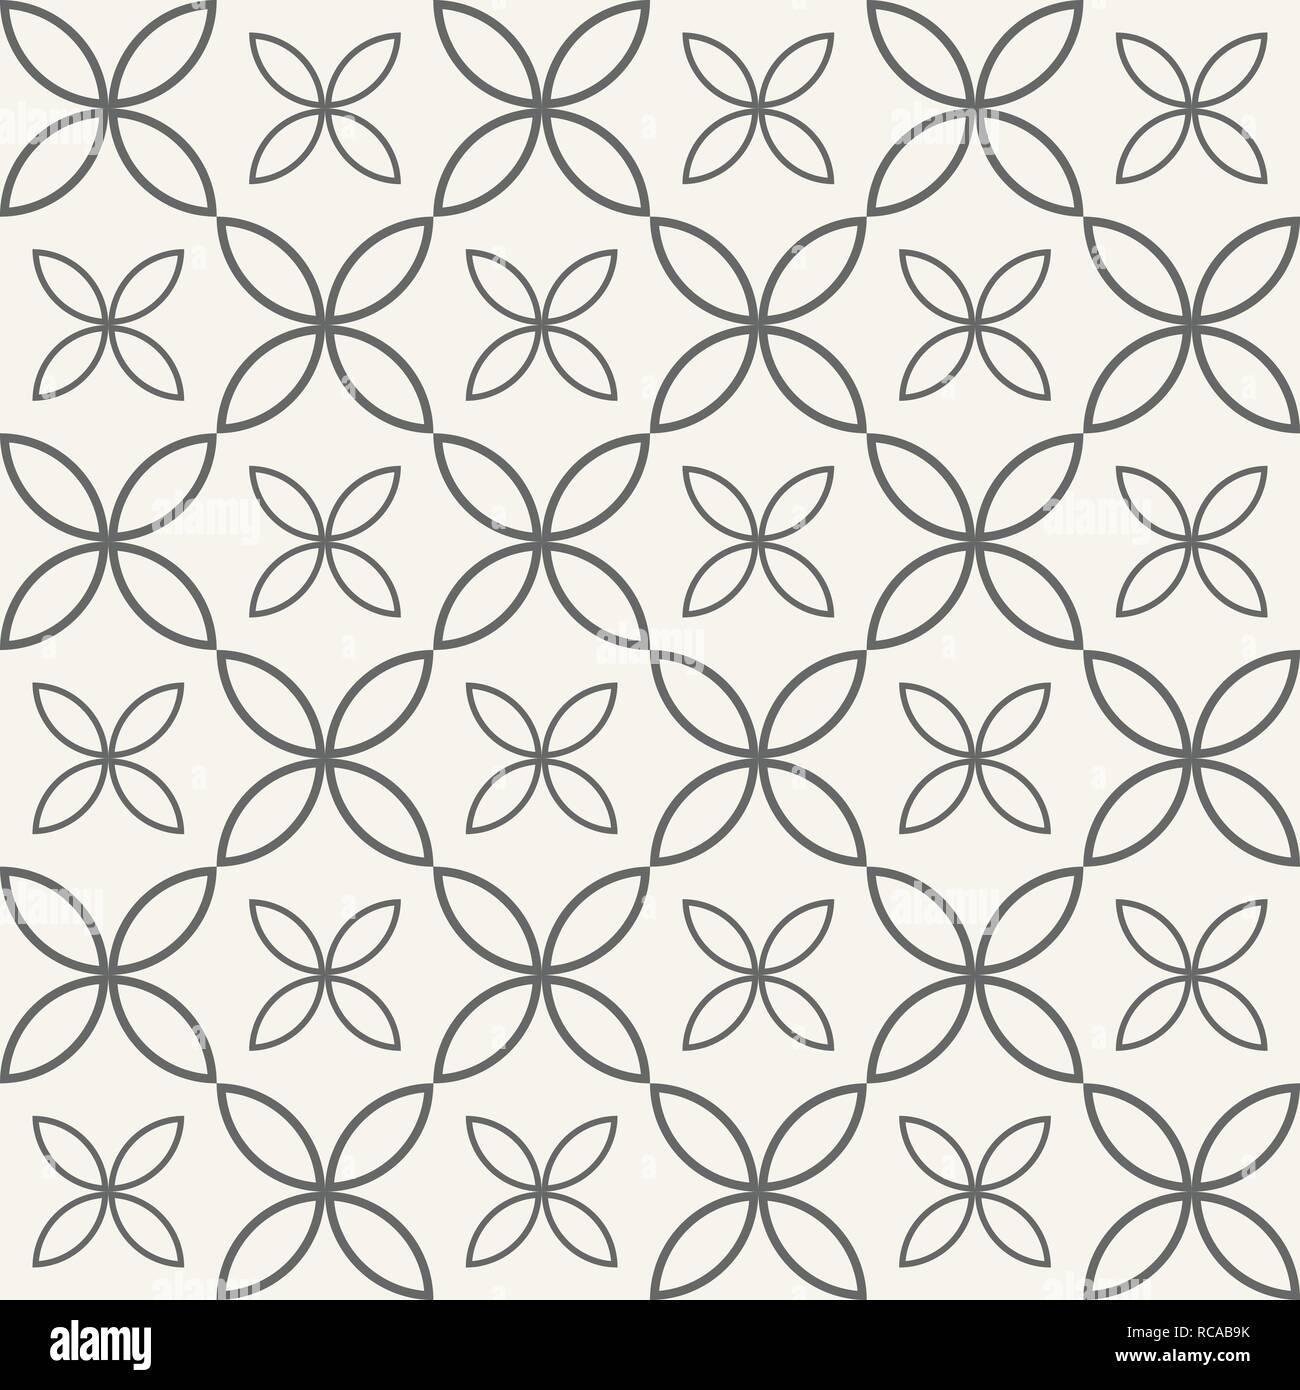 Abstract Seamless Ornamental Quatrefoil Pattern Vector